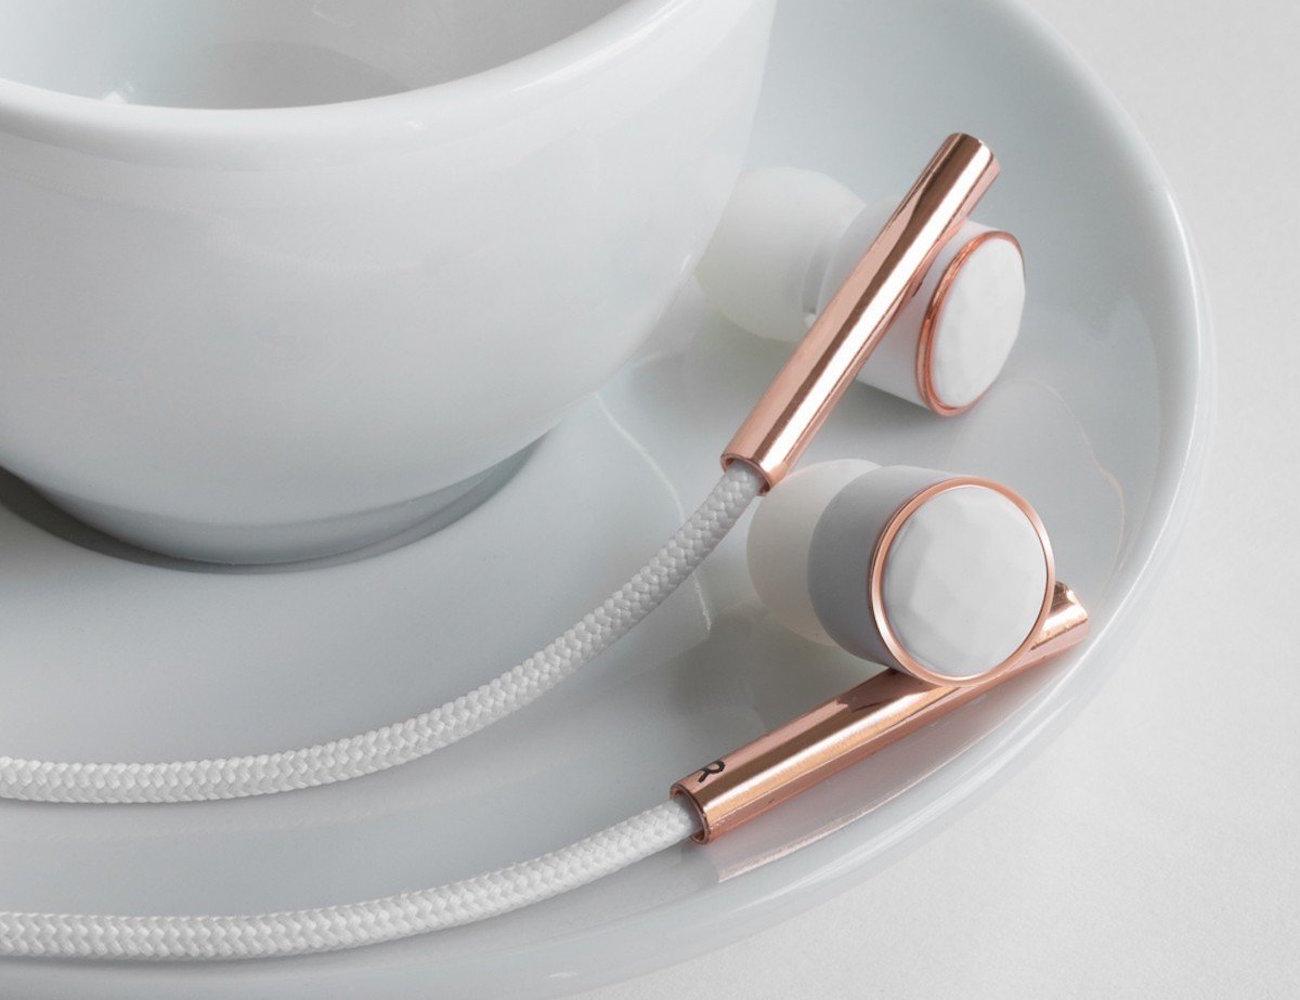 Apple earbuds mini - apple earbuds holders